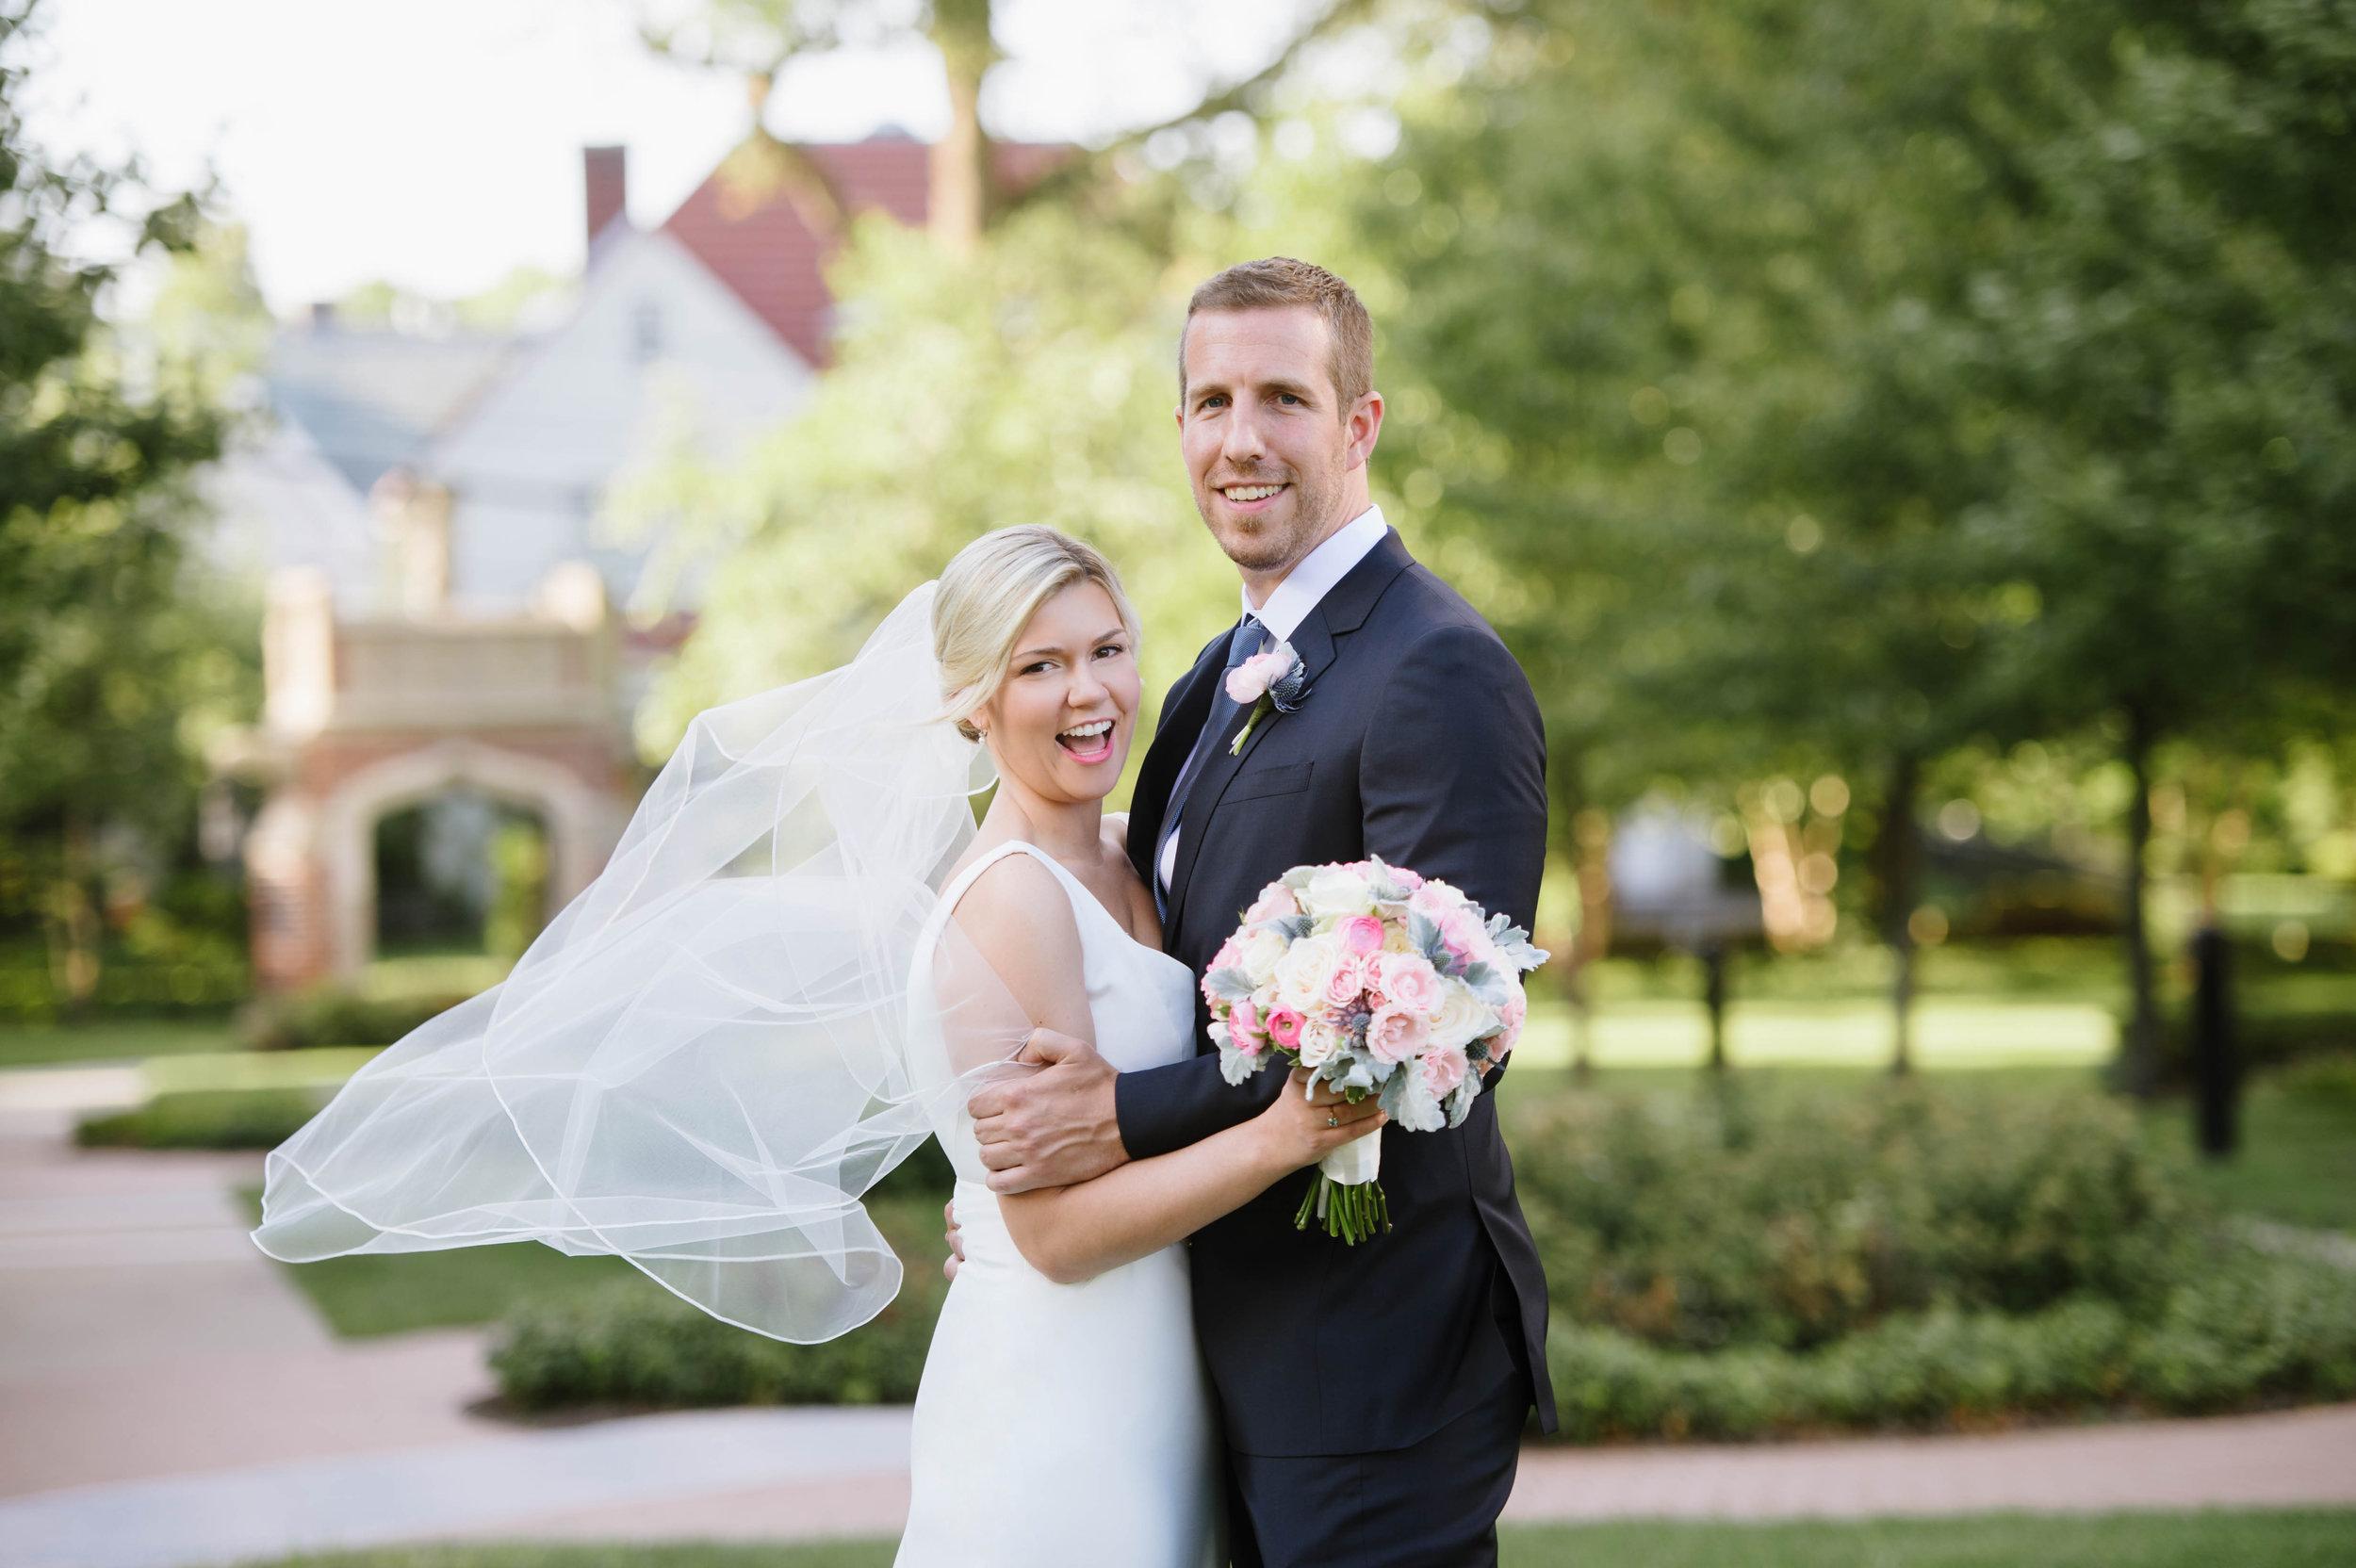 Boston_Wedding_Katie_Noble003.jpg